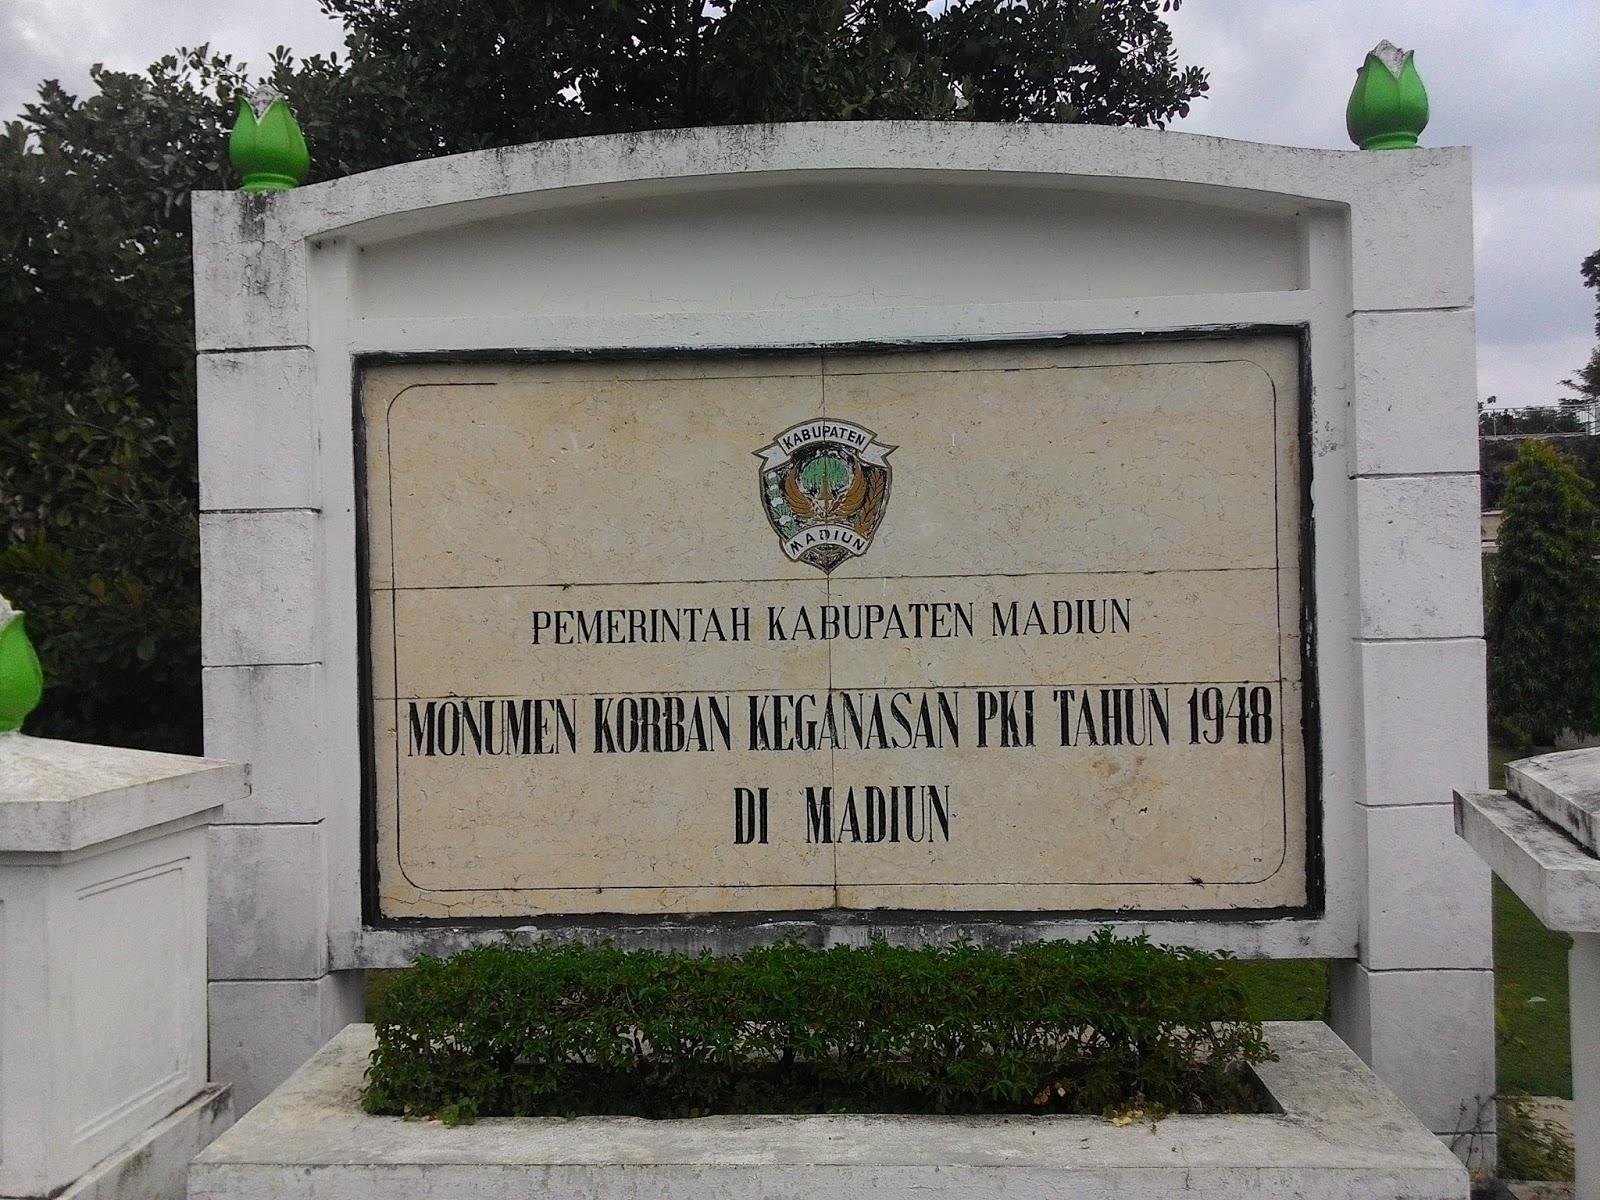 Monumen Kresek Bukti Kebrutalan Pki 1948 Madiun Punya Cerita Kab